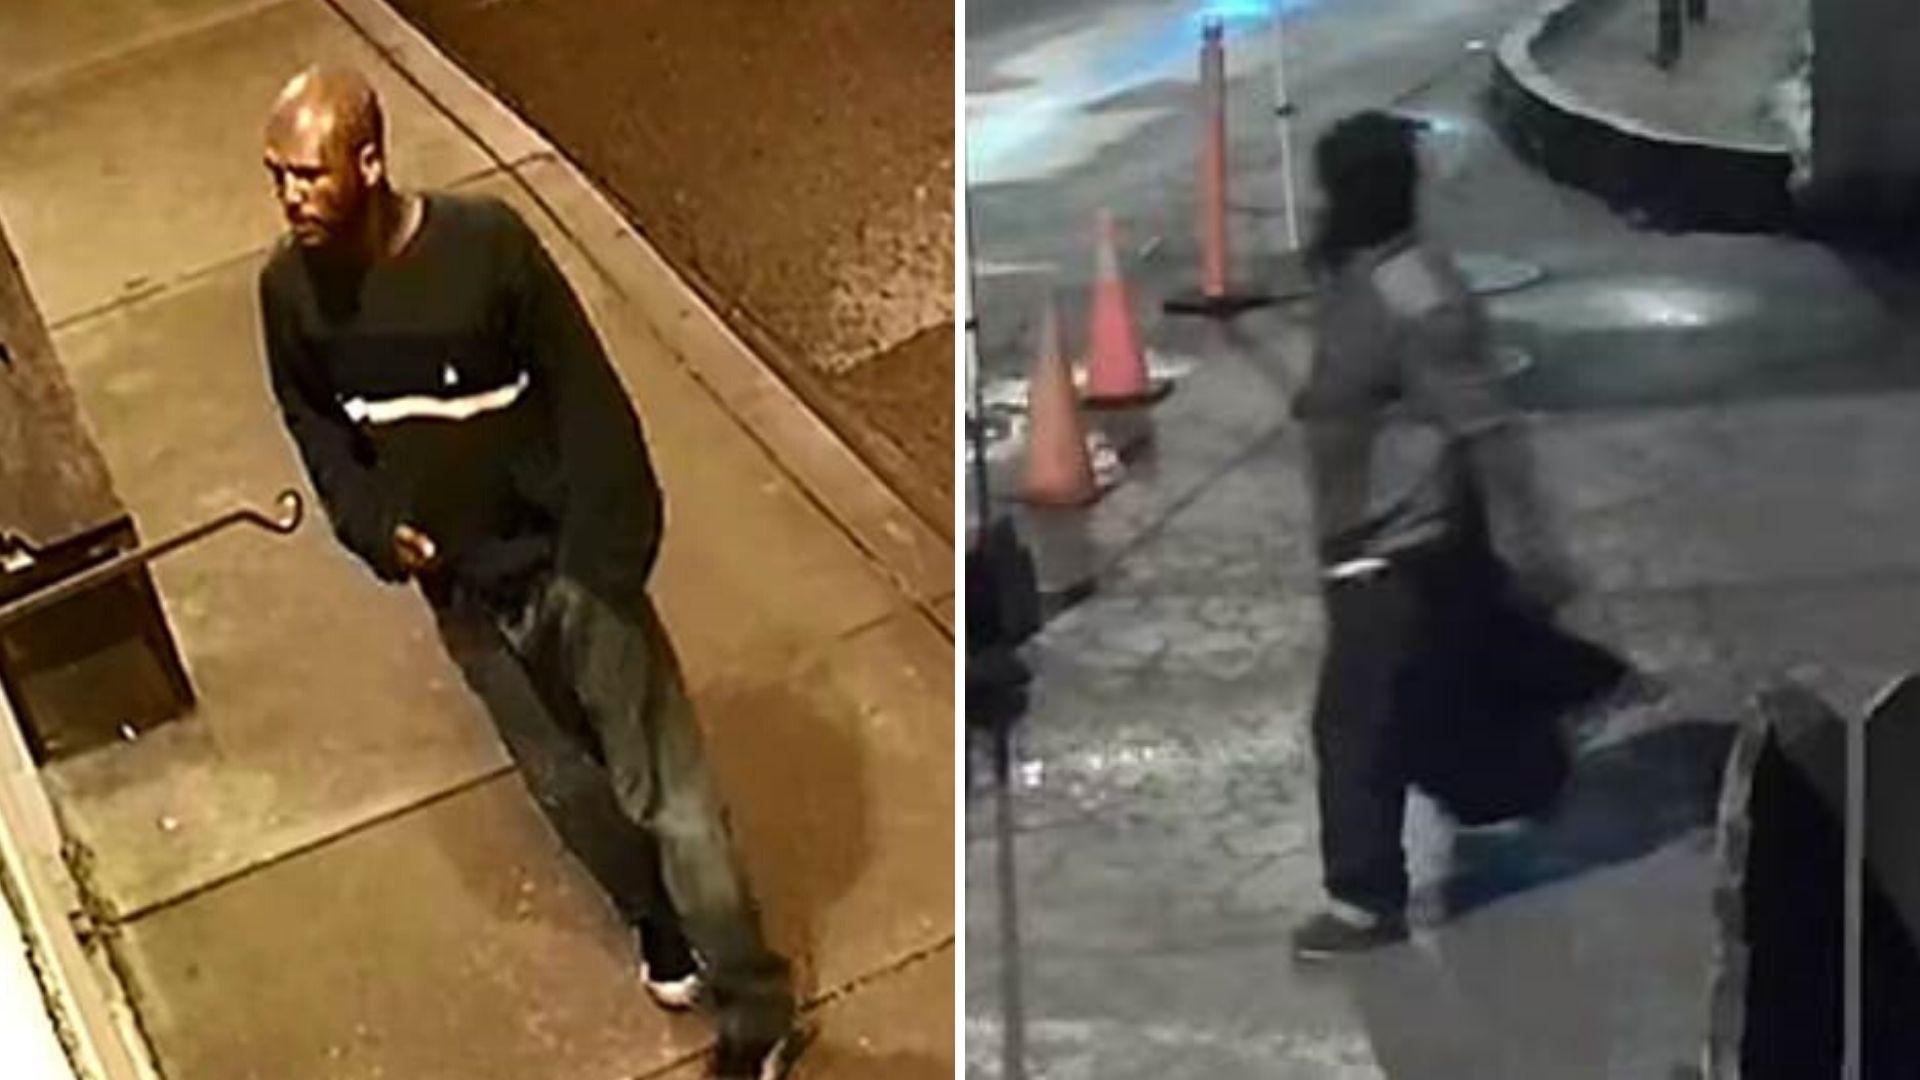 East Nashville Restaurant Burglary Suspects - 3/26/2020